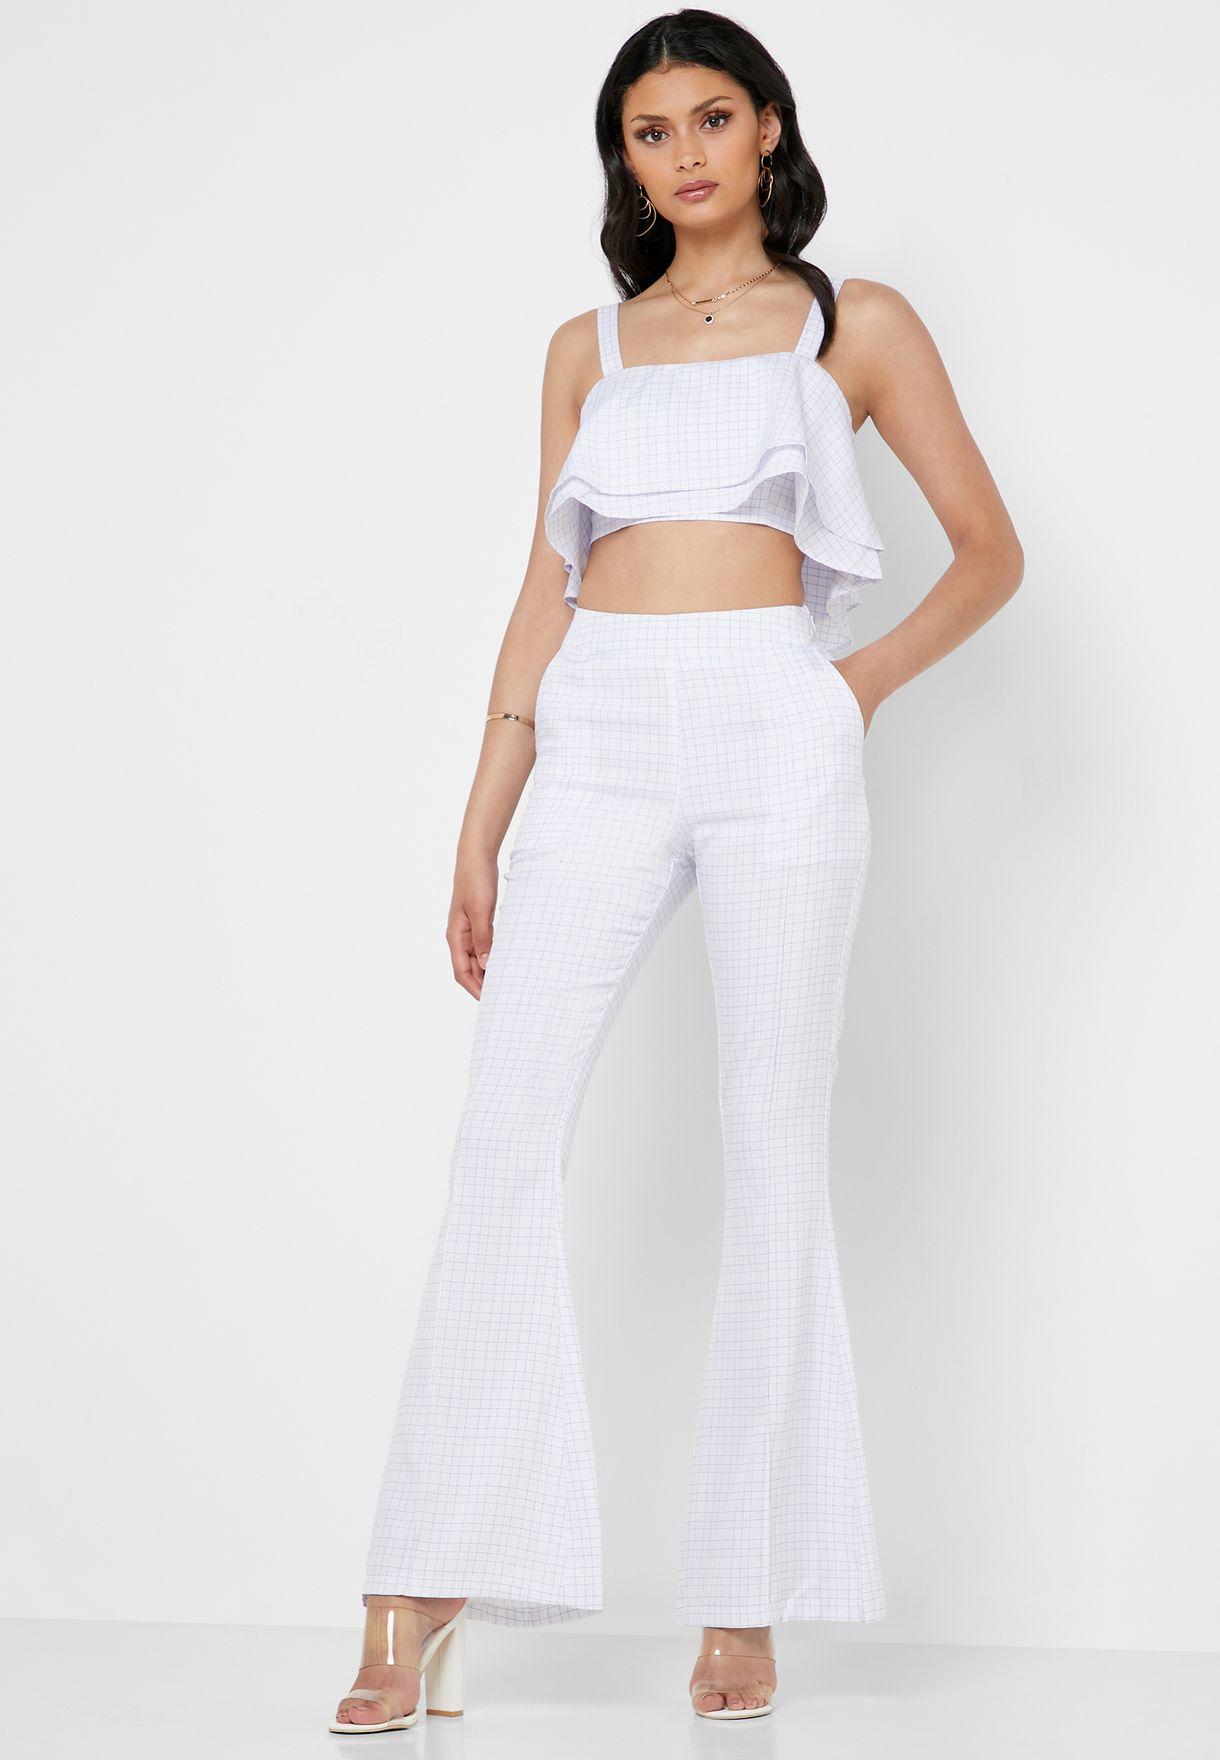 Layered Crop Top & High Waist Pants Set